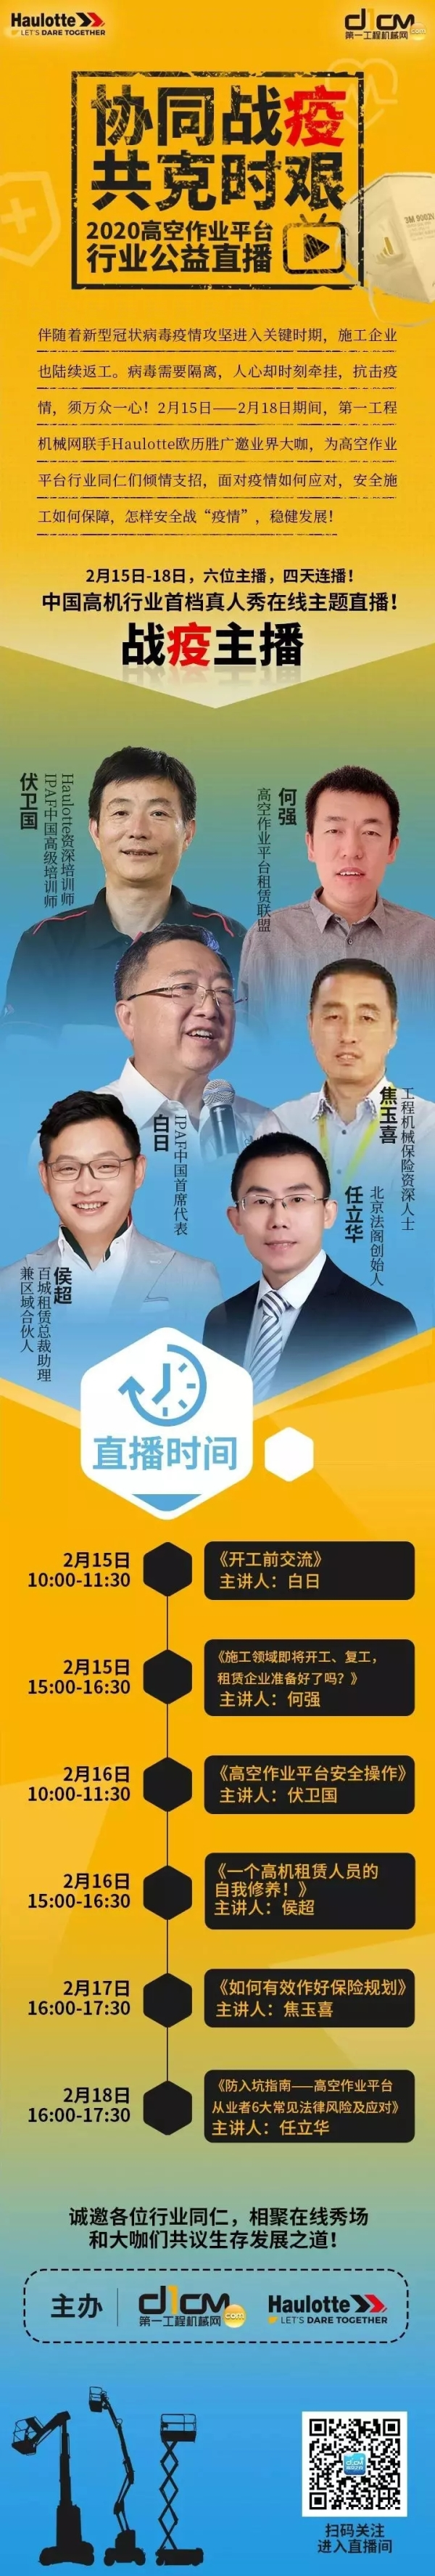 betvip365亚洲版官网联手Haulotte欧历胜推出高机行业首档公益主题在线直播节目